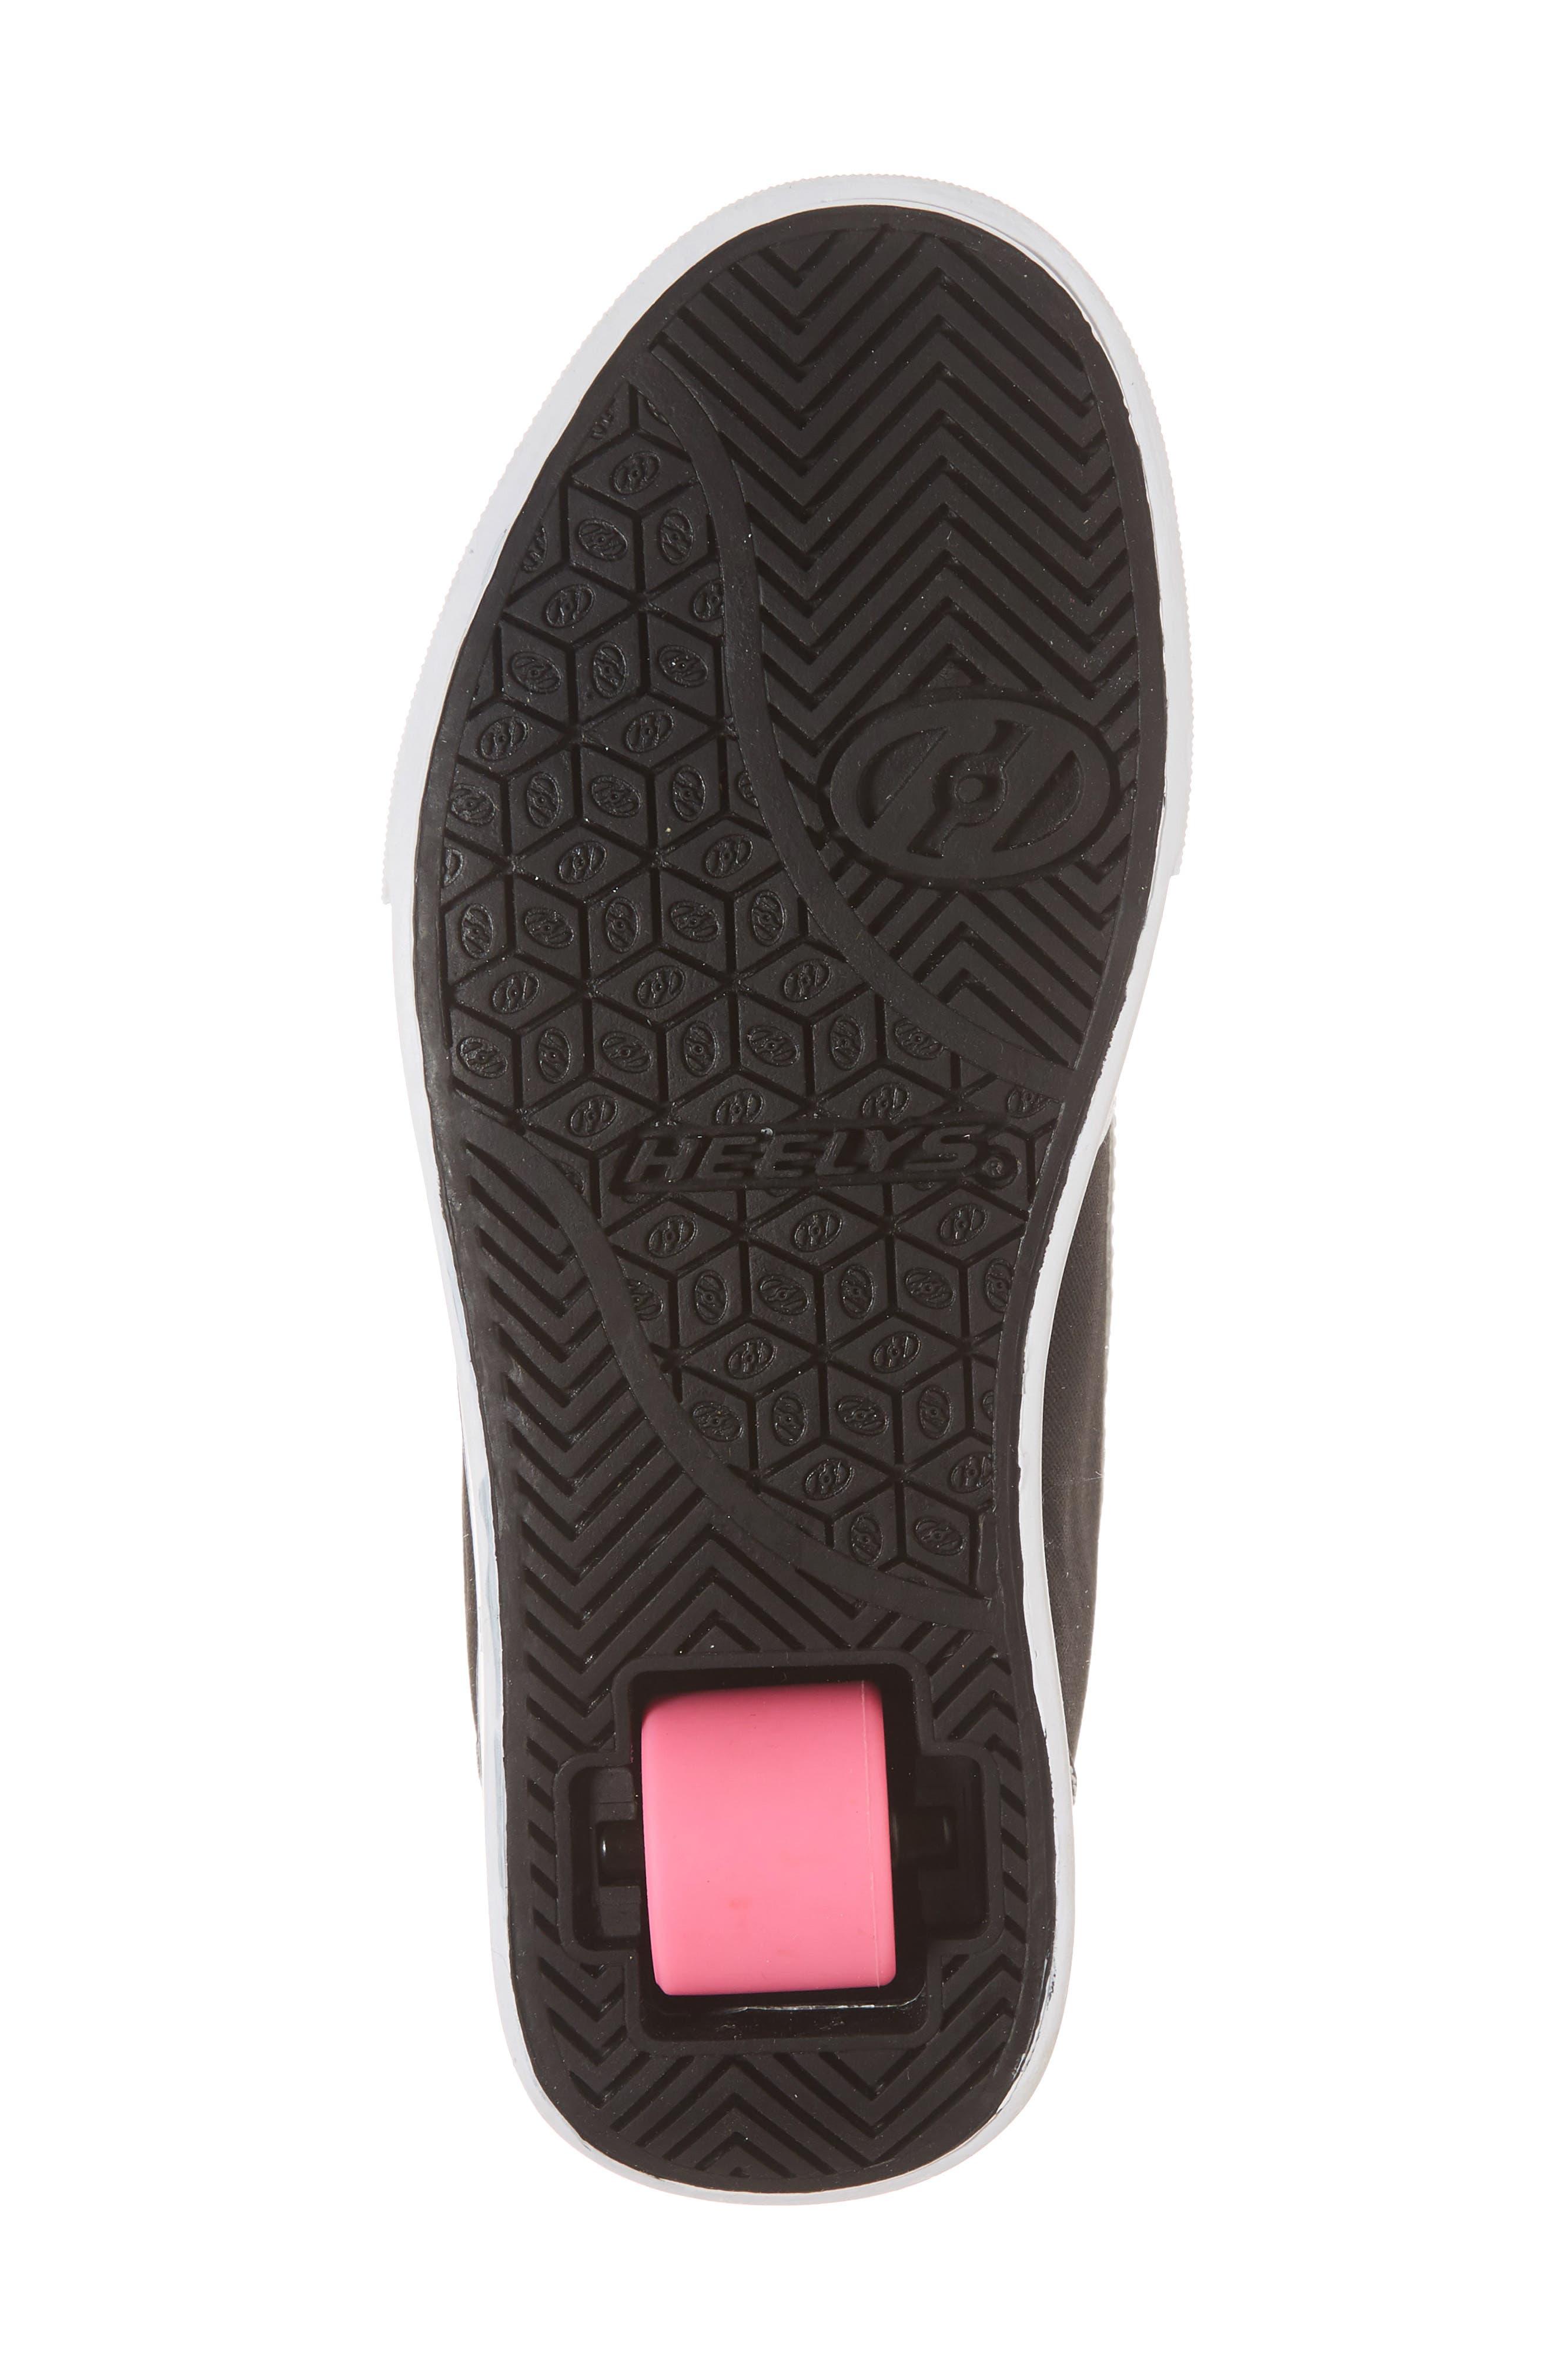 GR8 Pro Wheeled Sneaker,                             Alternate thumbnail 6, color,                             Black/ White/ Hot Pink